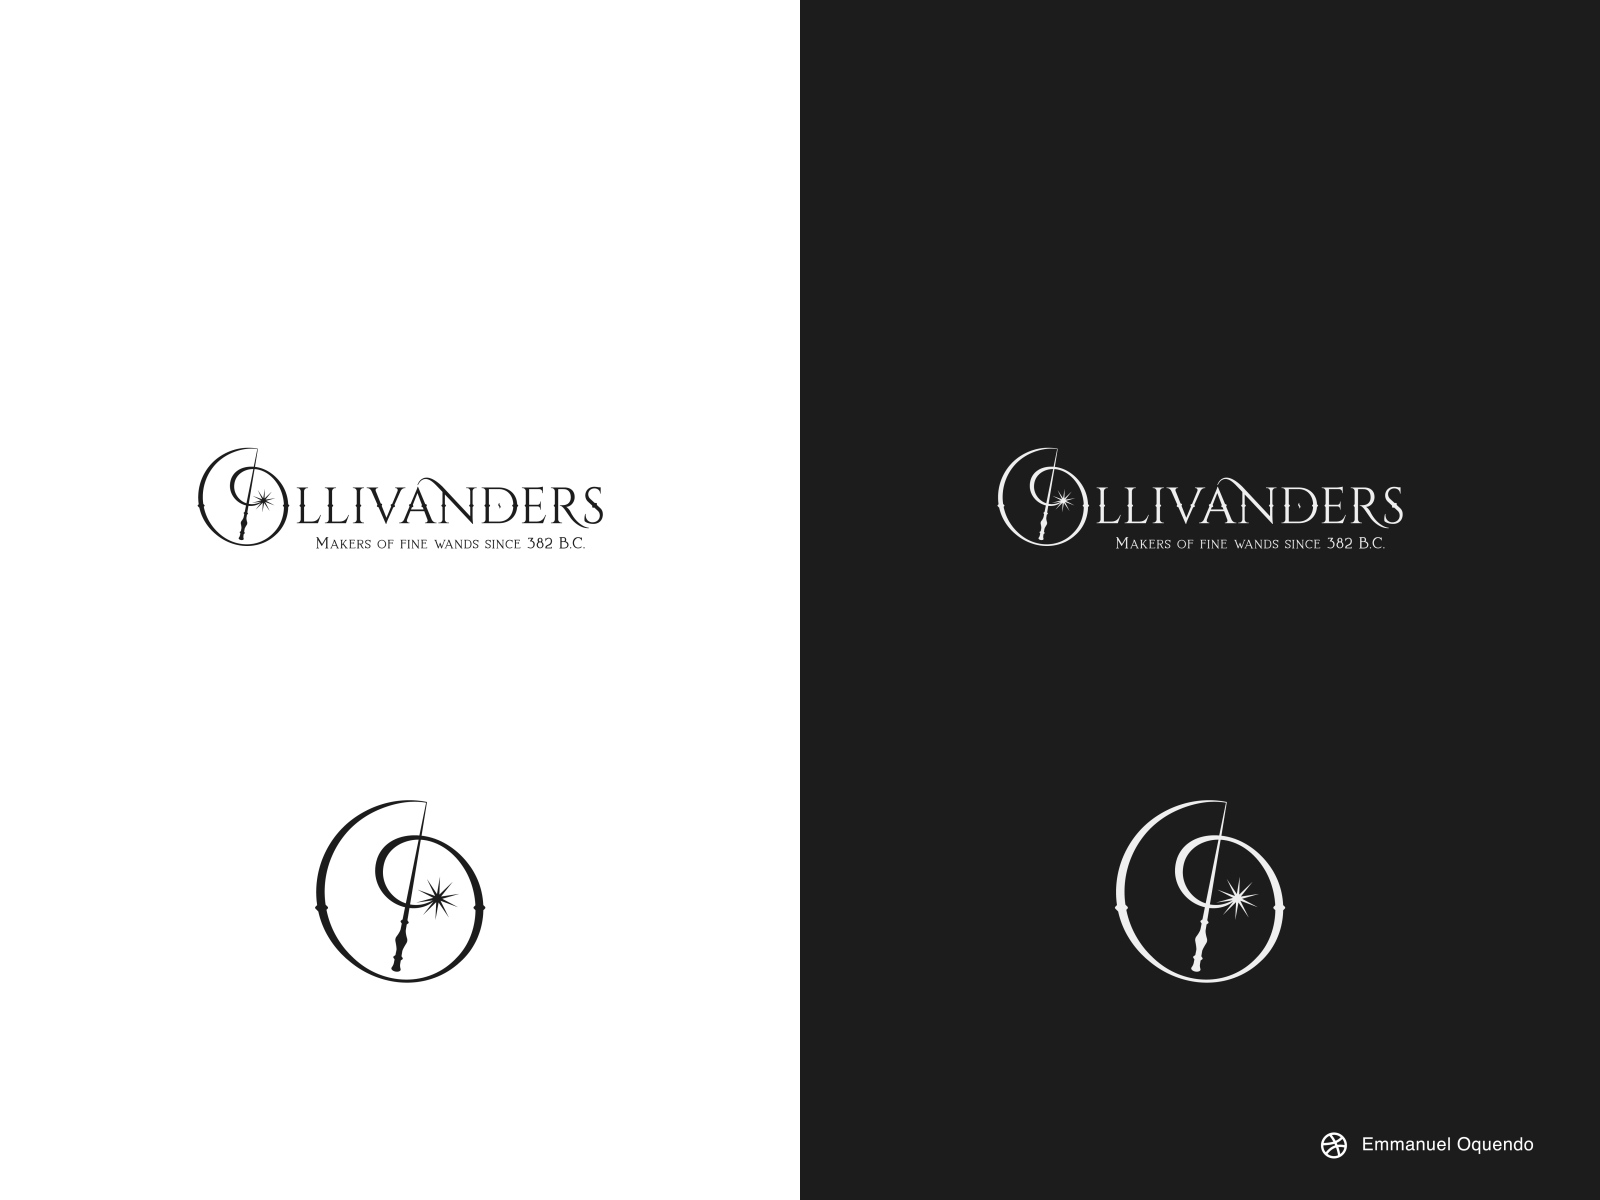 Ollivanders by Emmanuel Oquendo on Dribbble